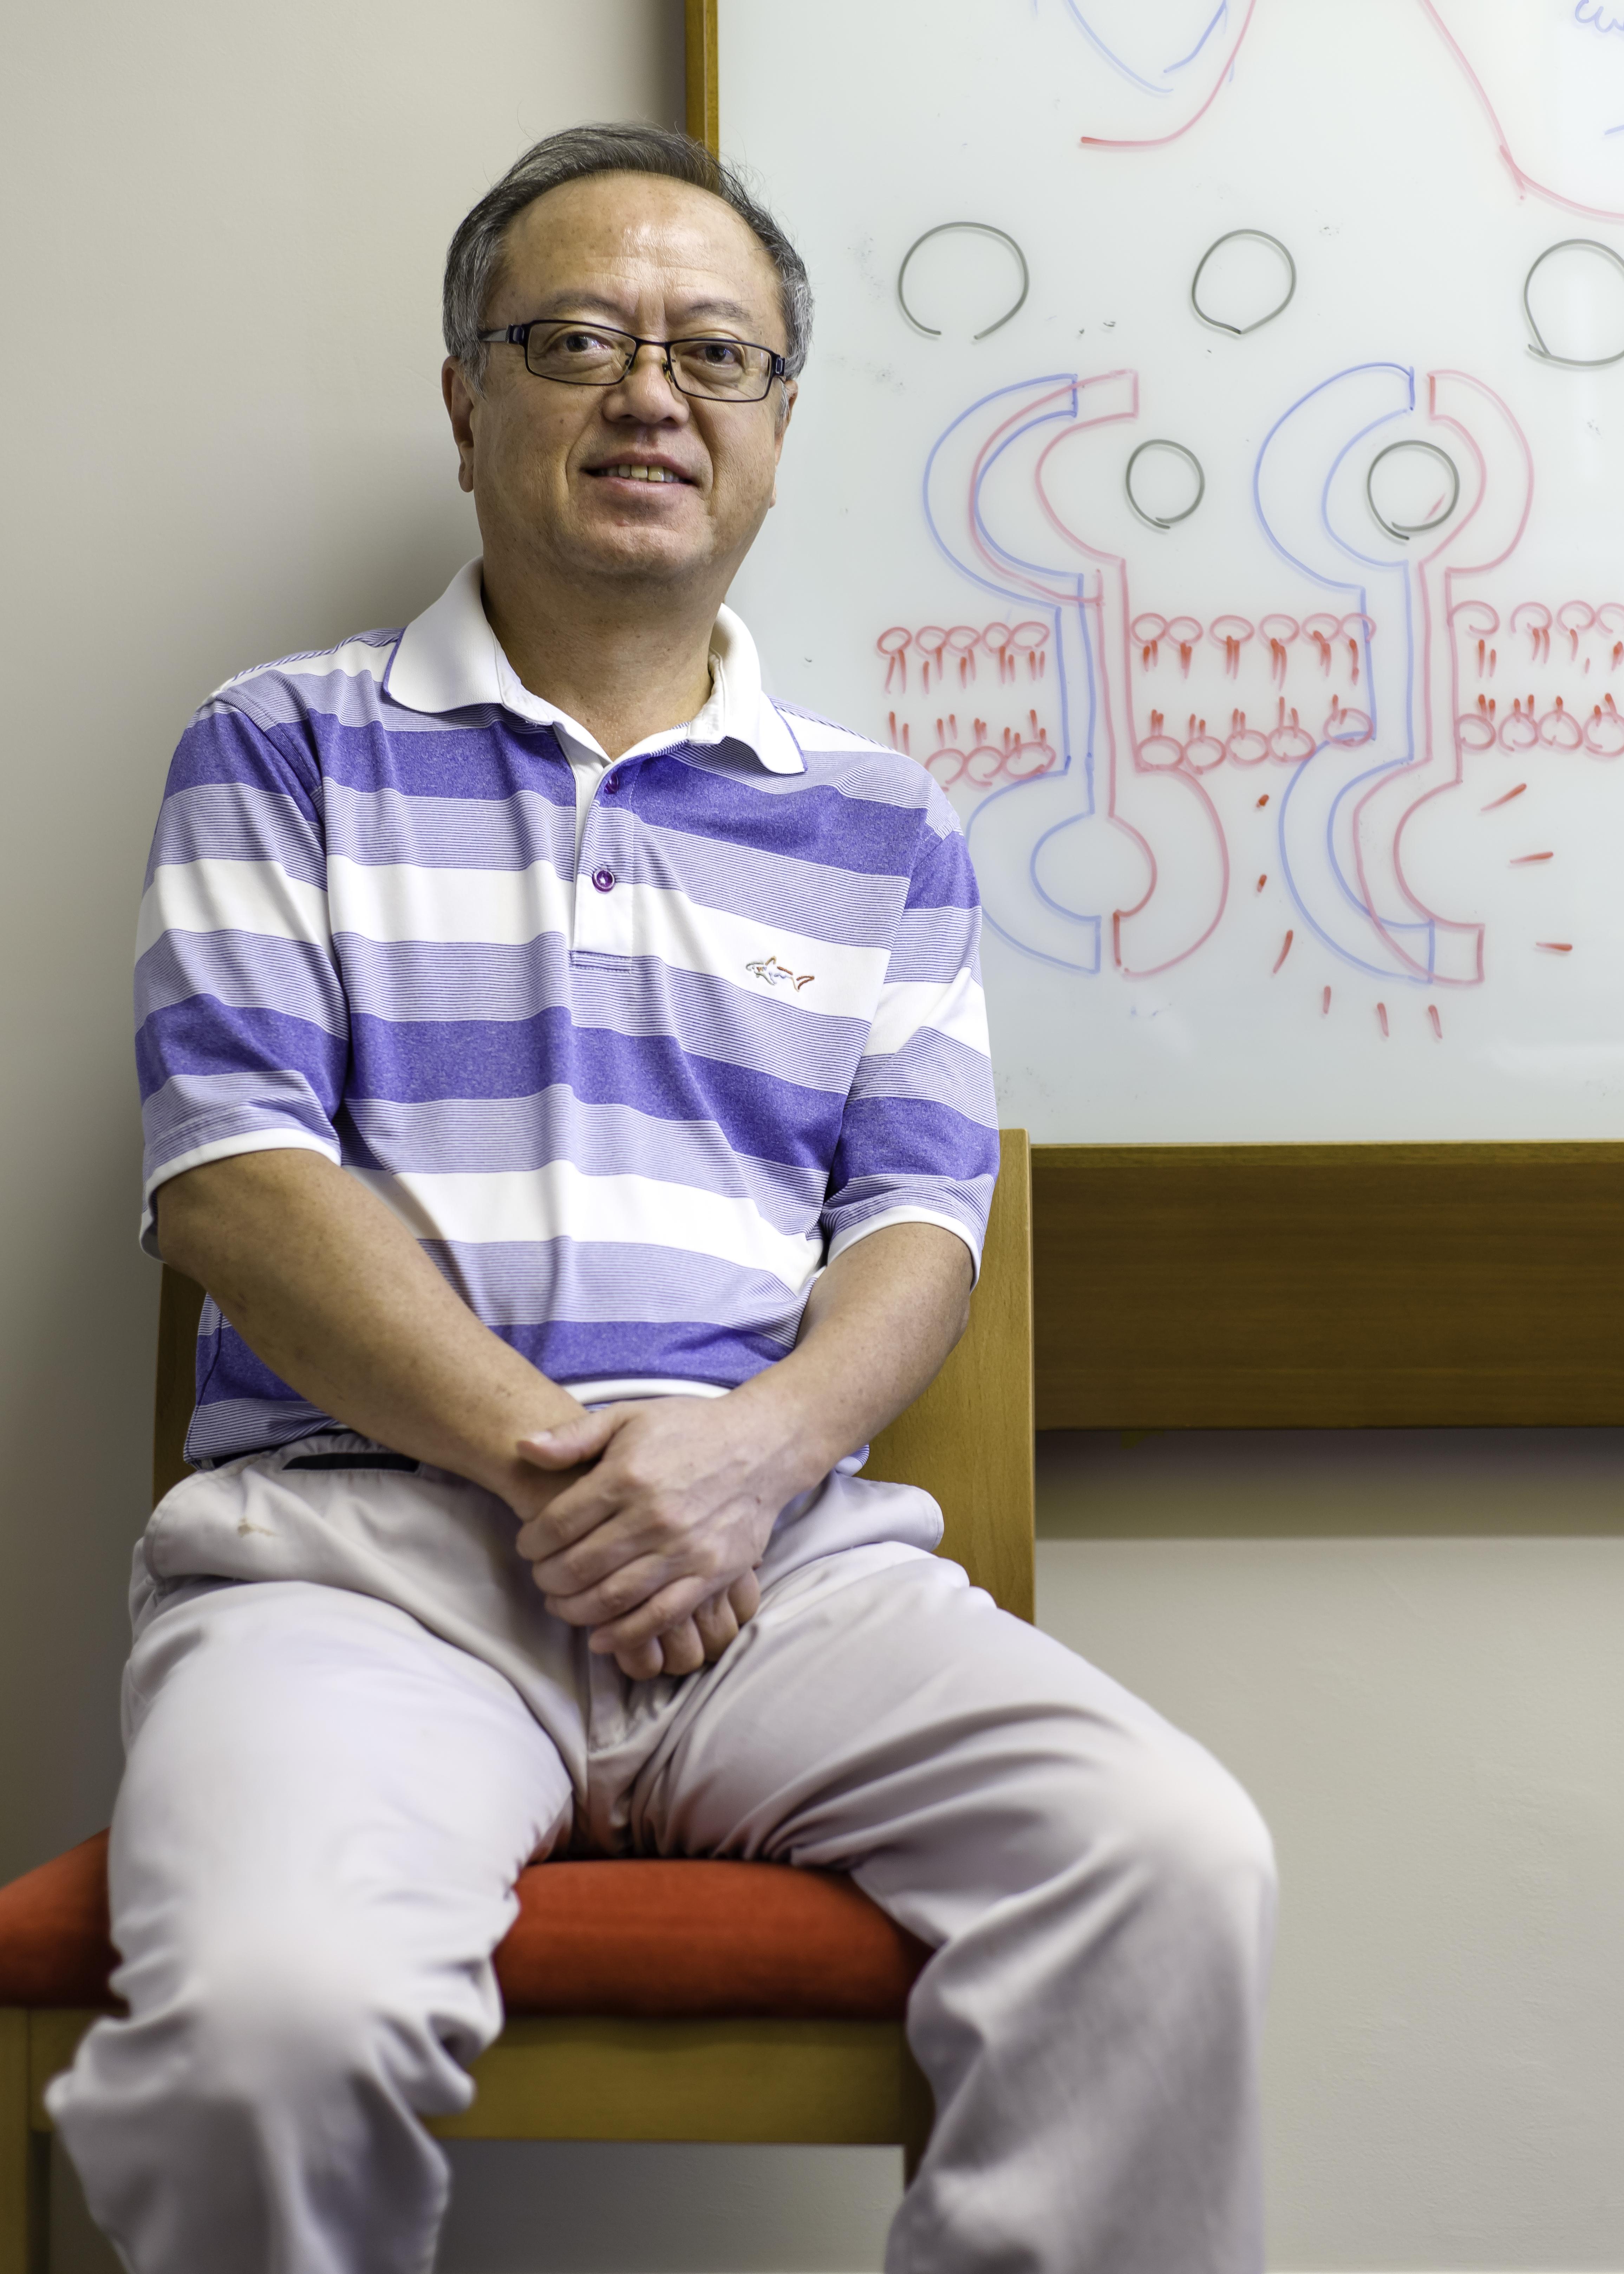 Prof. Maruyama